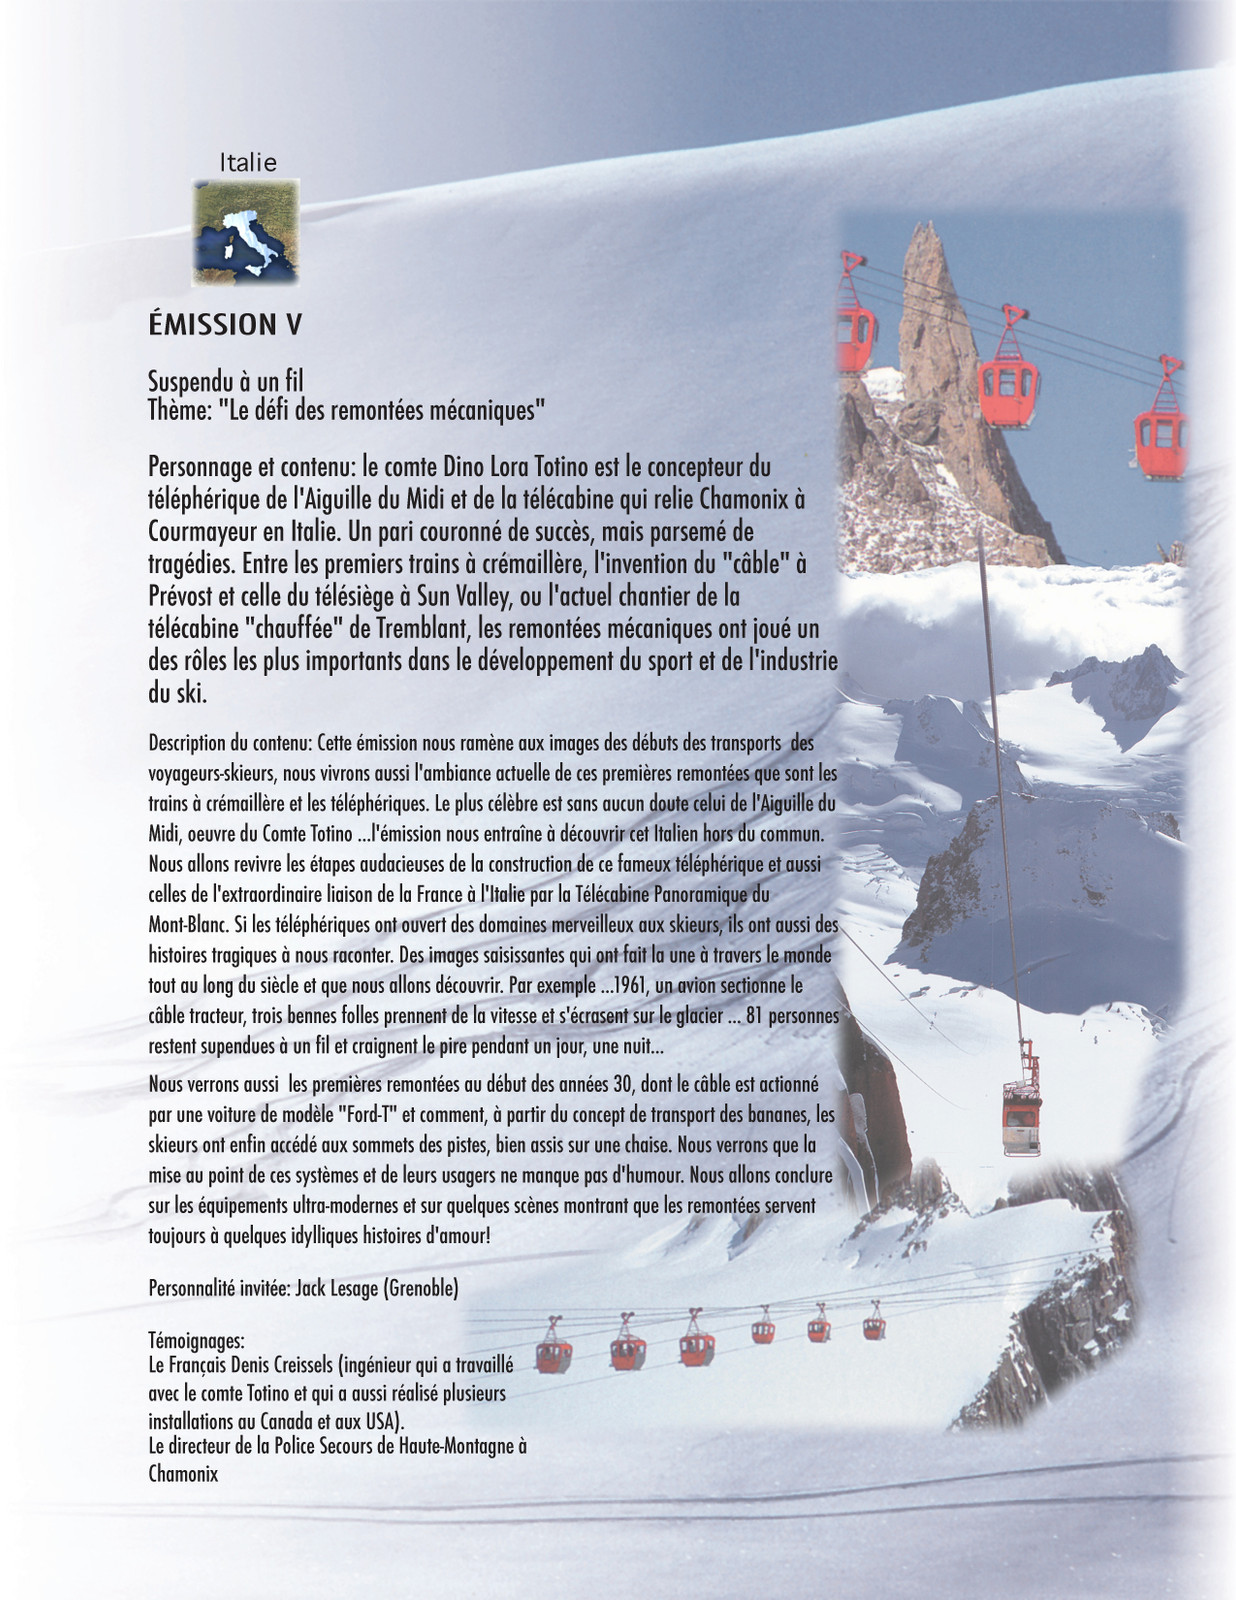 Aventure SkiLa Du Cataloguegrande Aventure SkiLa Du Cataloguegrande lKFcJT1